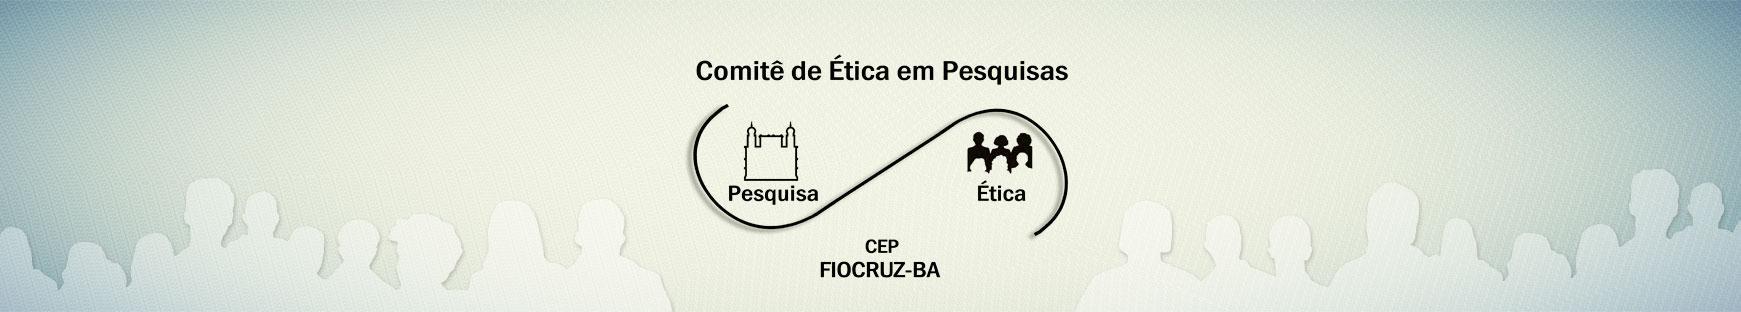 TOPO-SITE-CEP-CEUA3